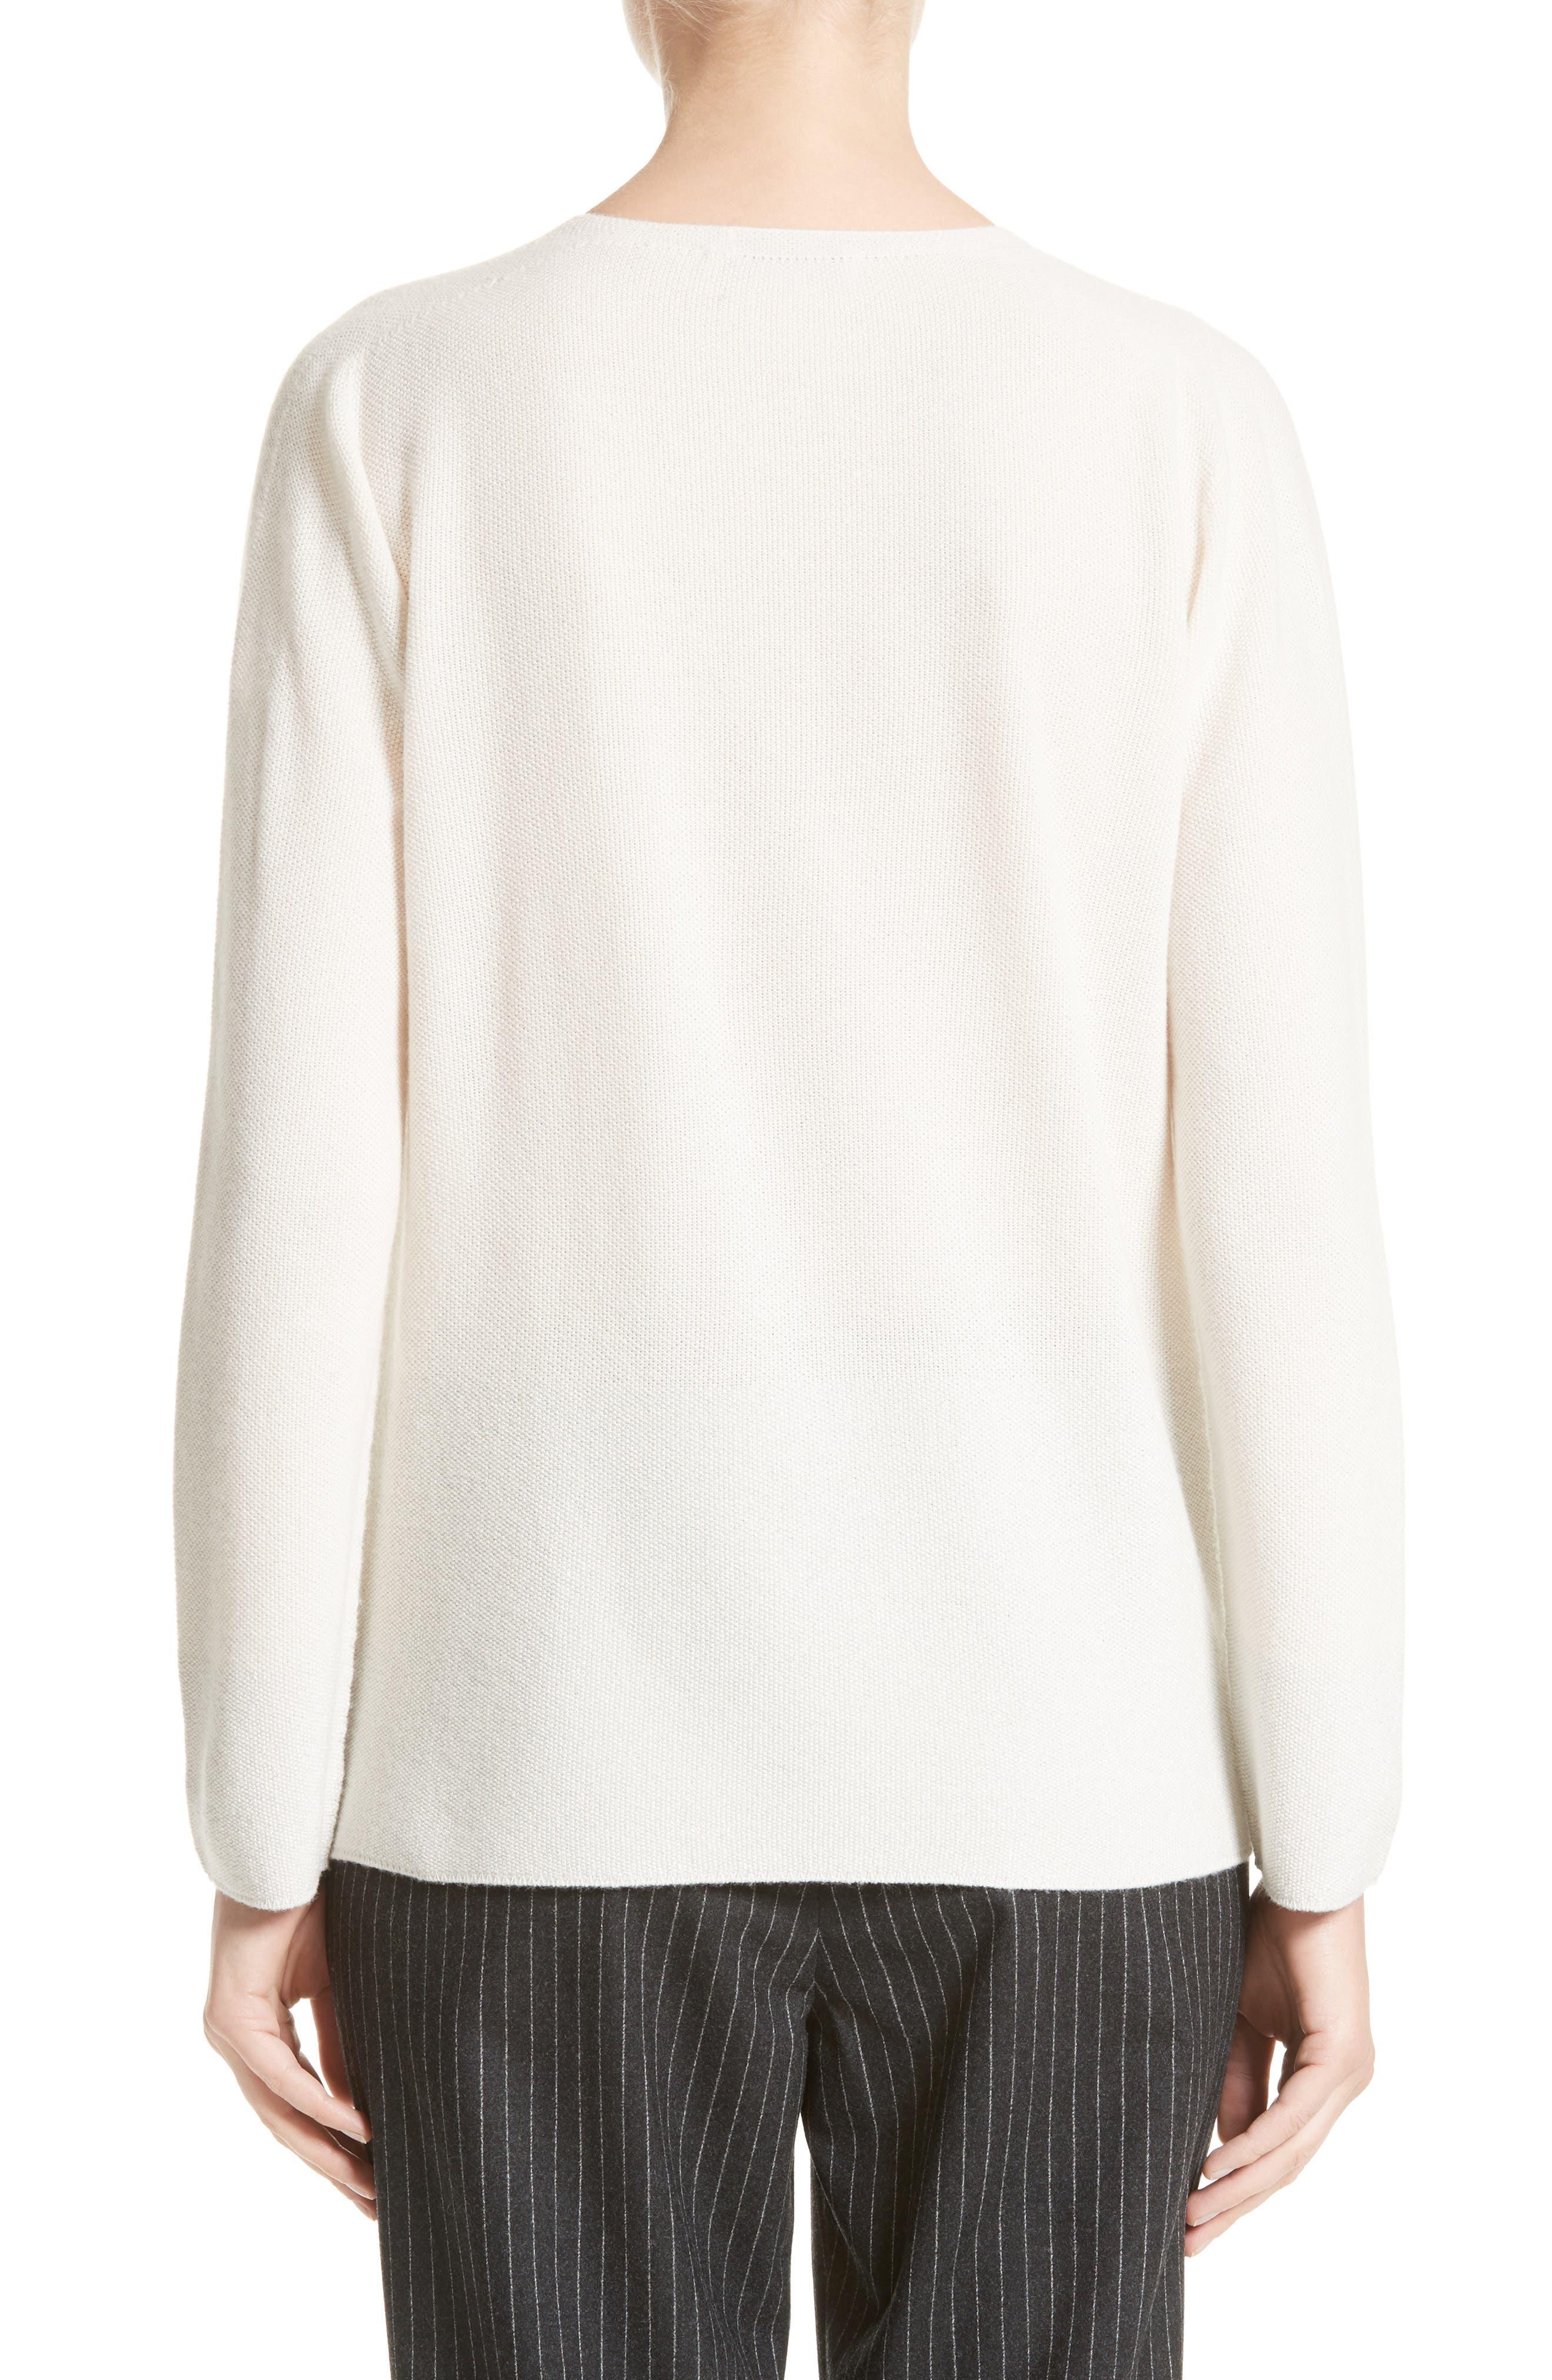 Wool, Silk & Cashmere Micro Popcorn Stitch Sweater,                             Alternate thumbnail 2, color,                             101